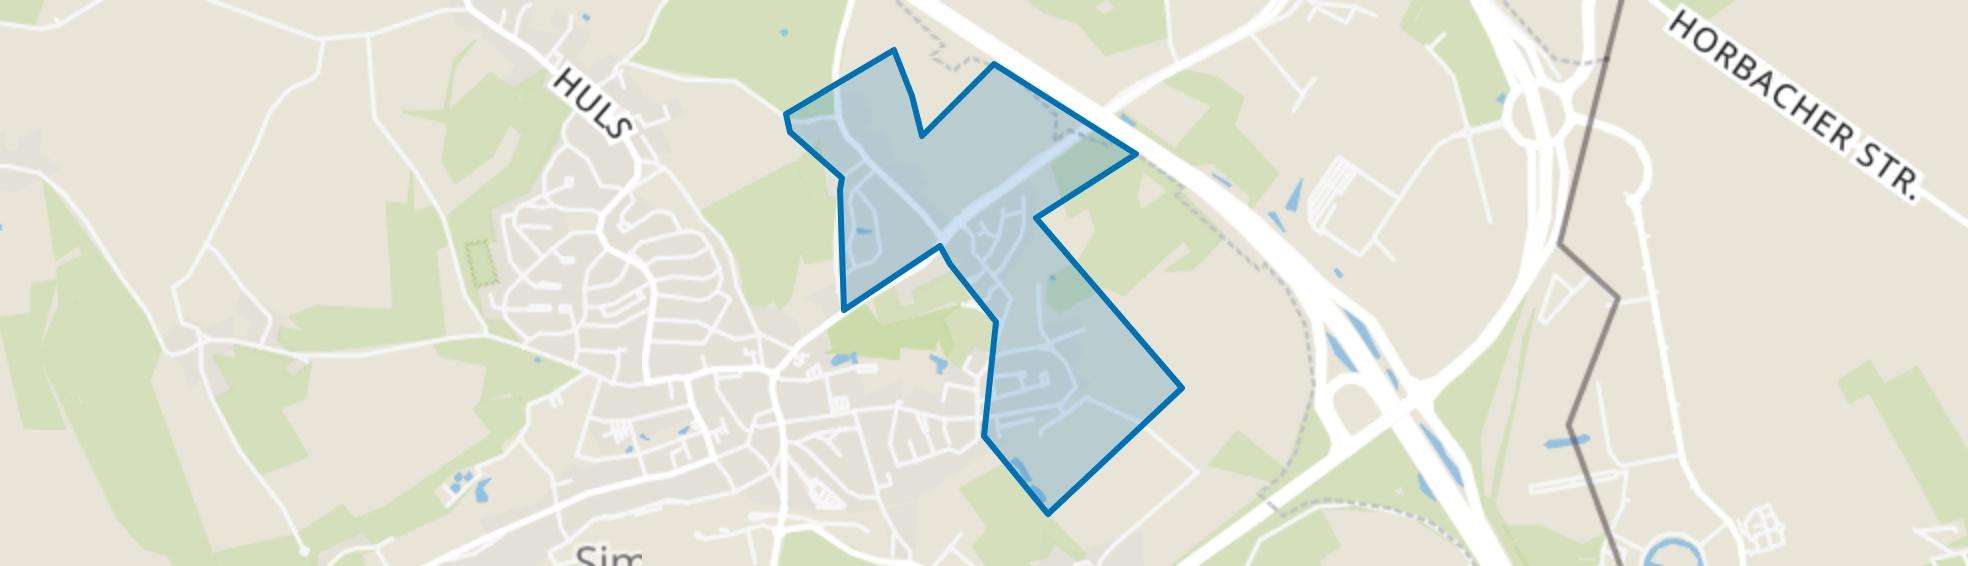 Molsberg-Rodeput, Simpelveld map